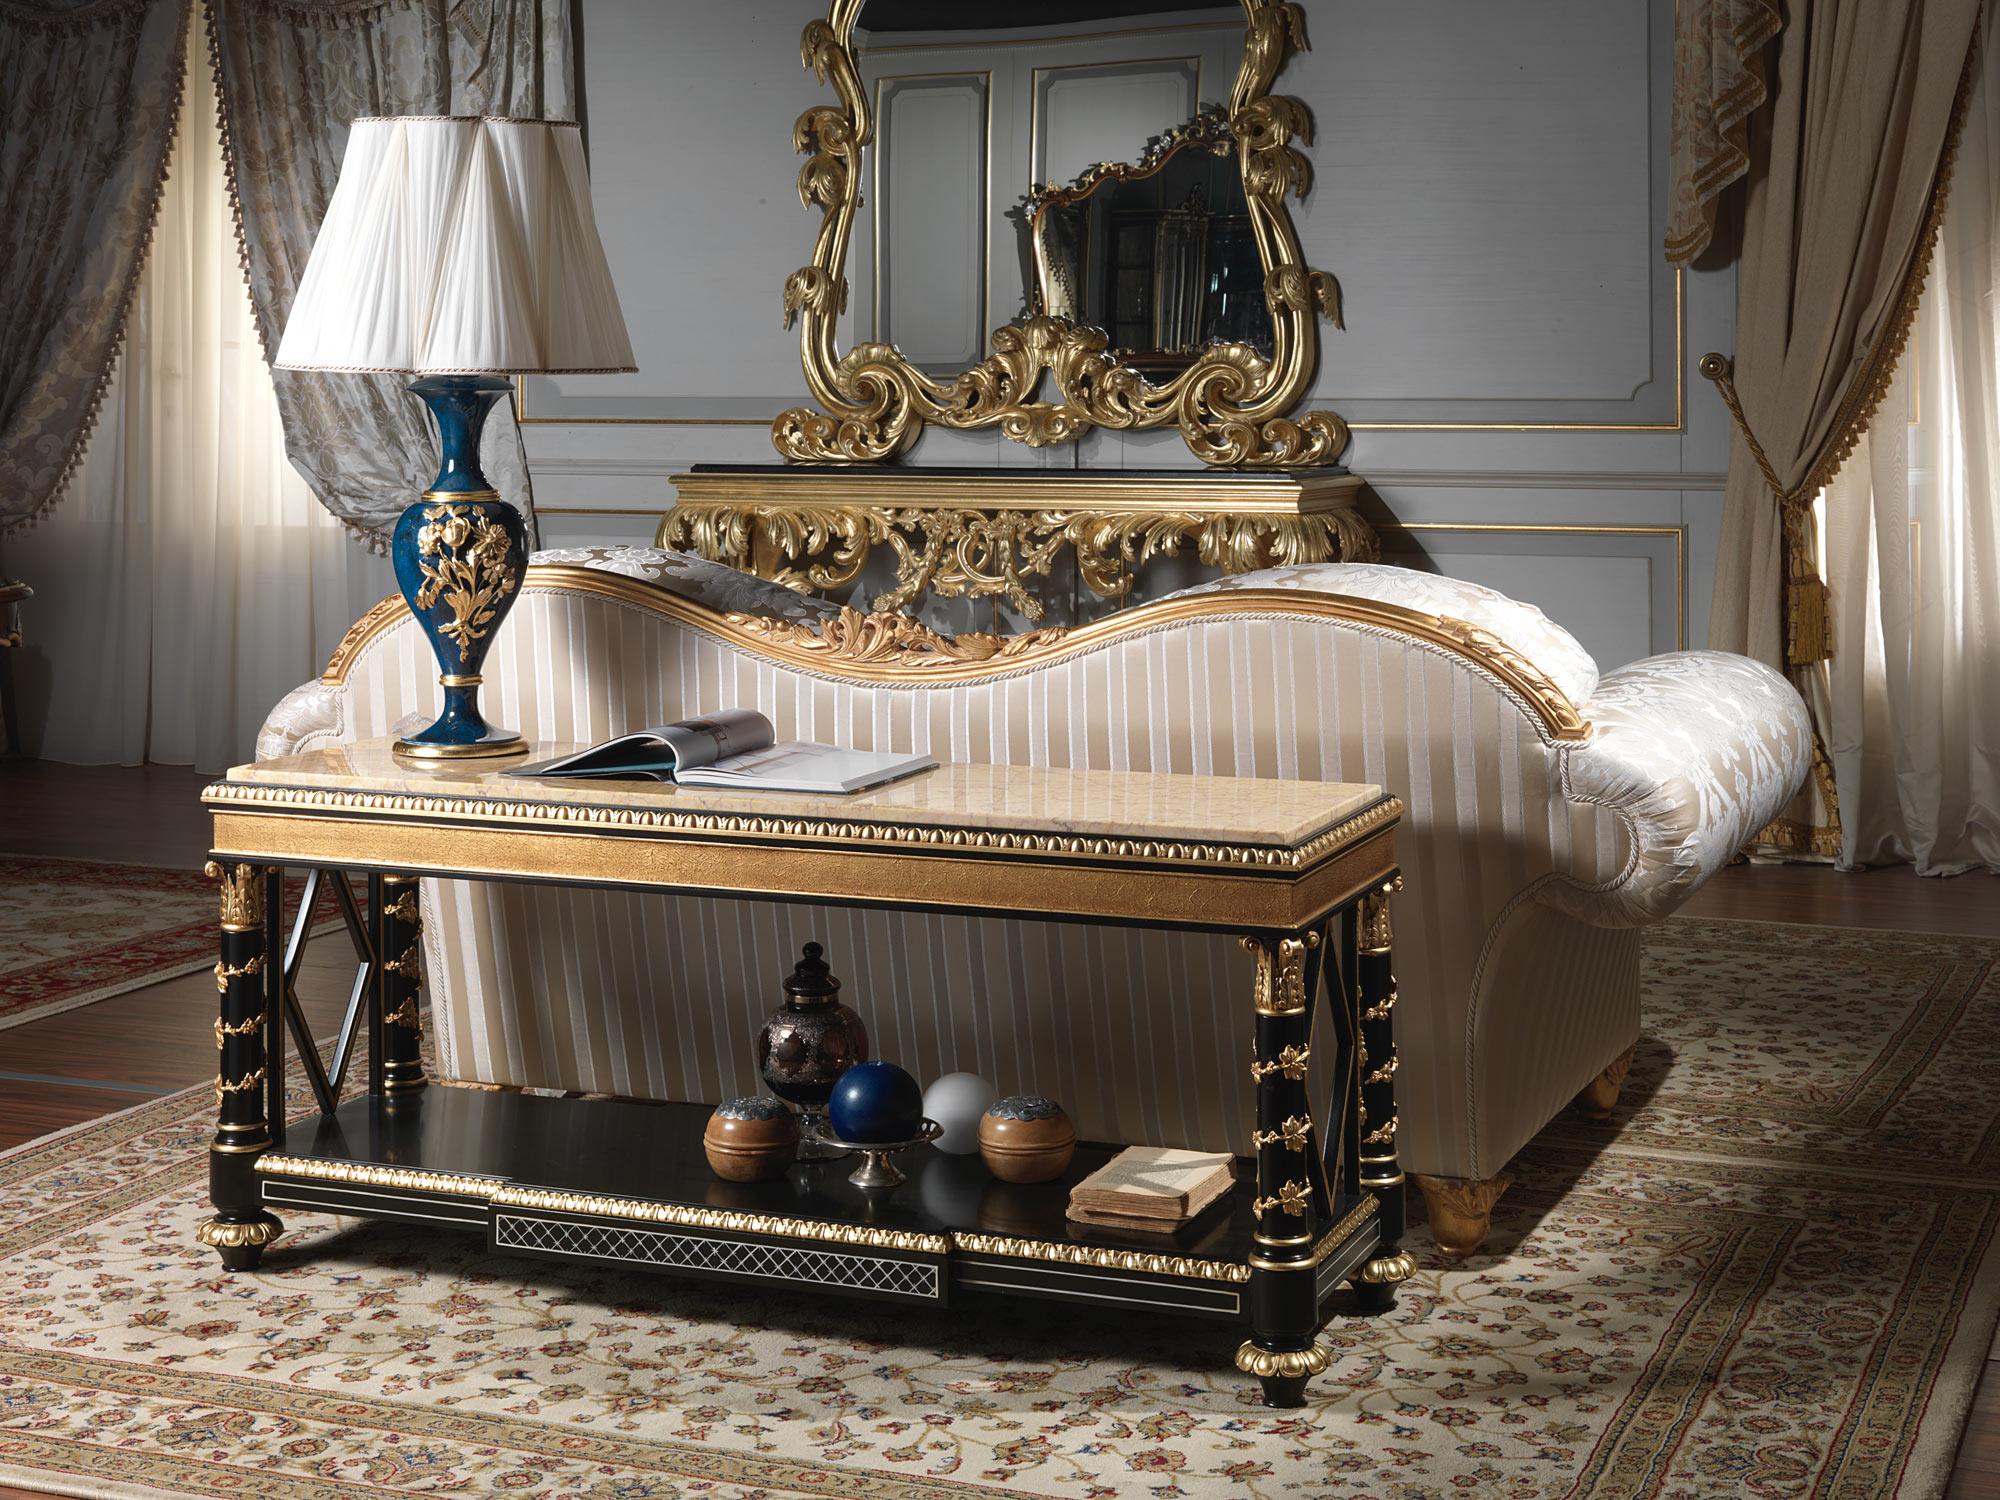 Louis Xv Classic Furniture Chinoiserie